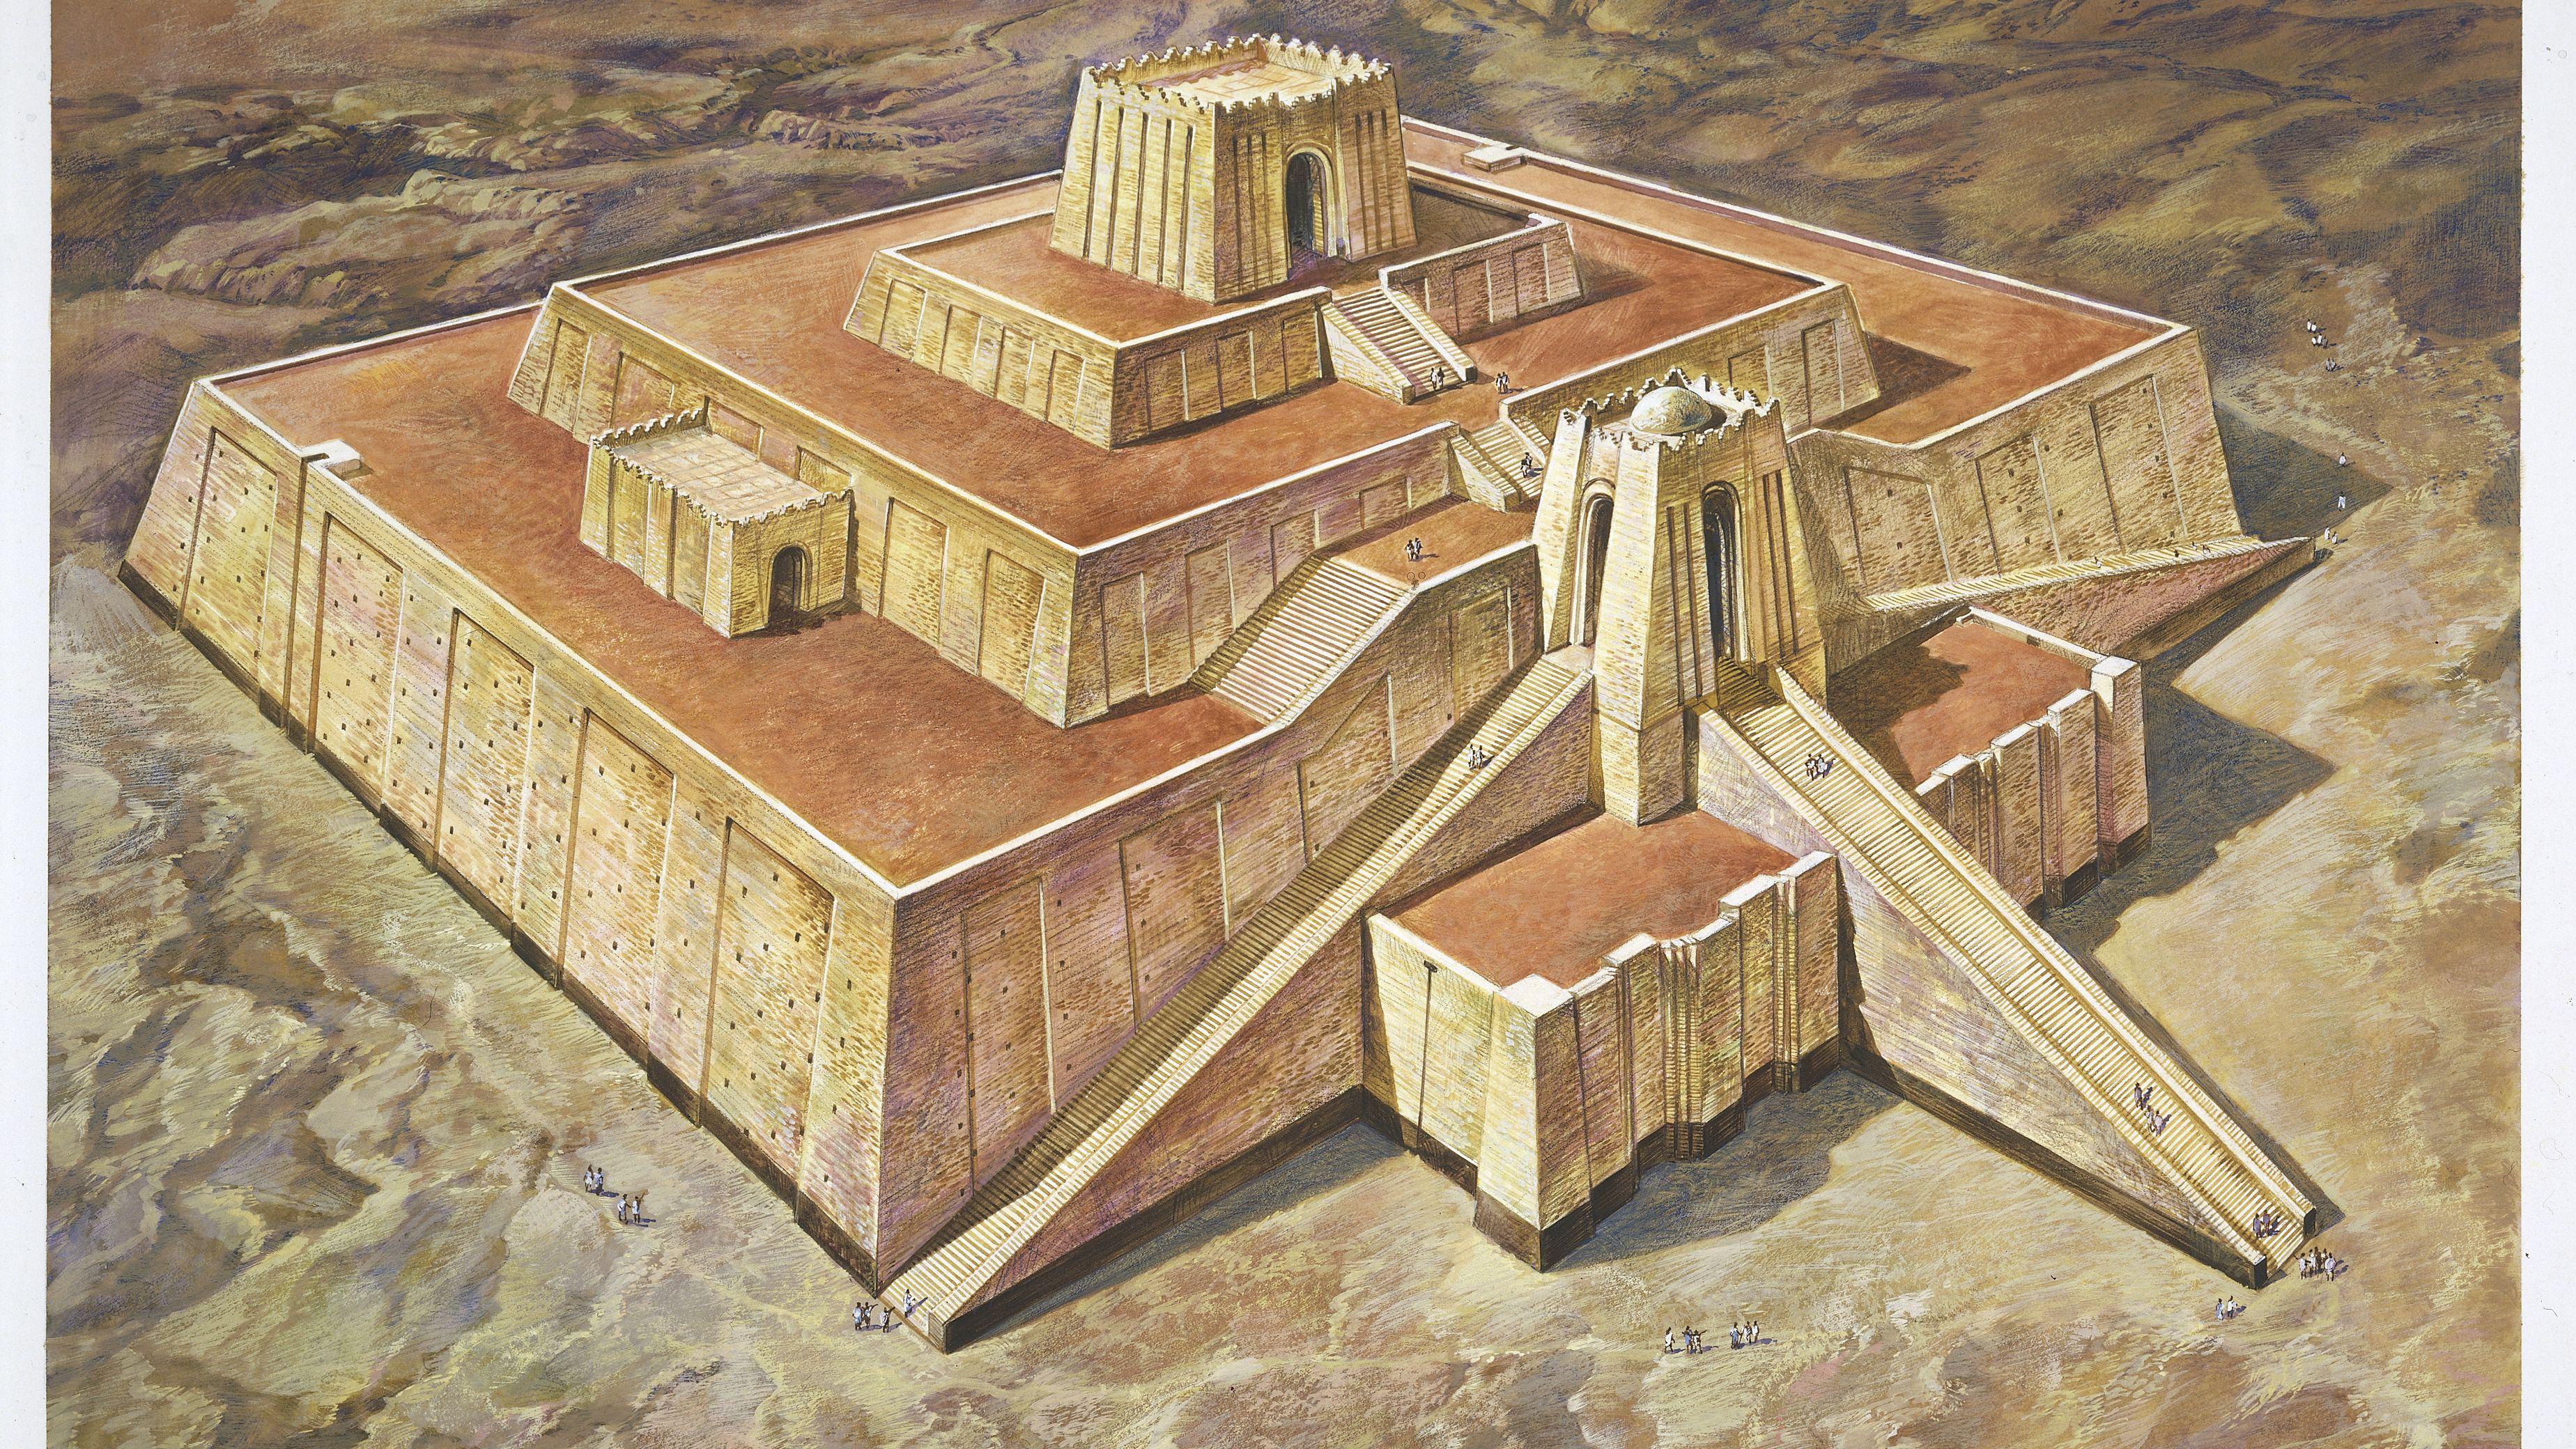 The Ziggurat: Ancient Temple to the Gods